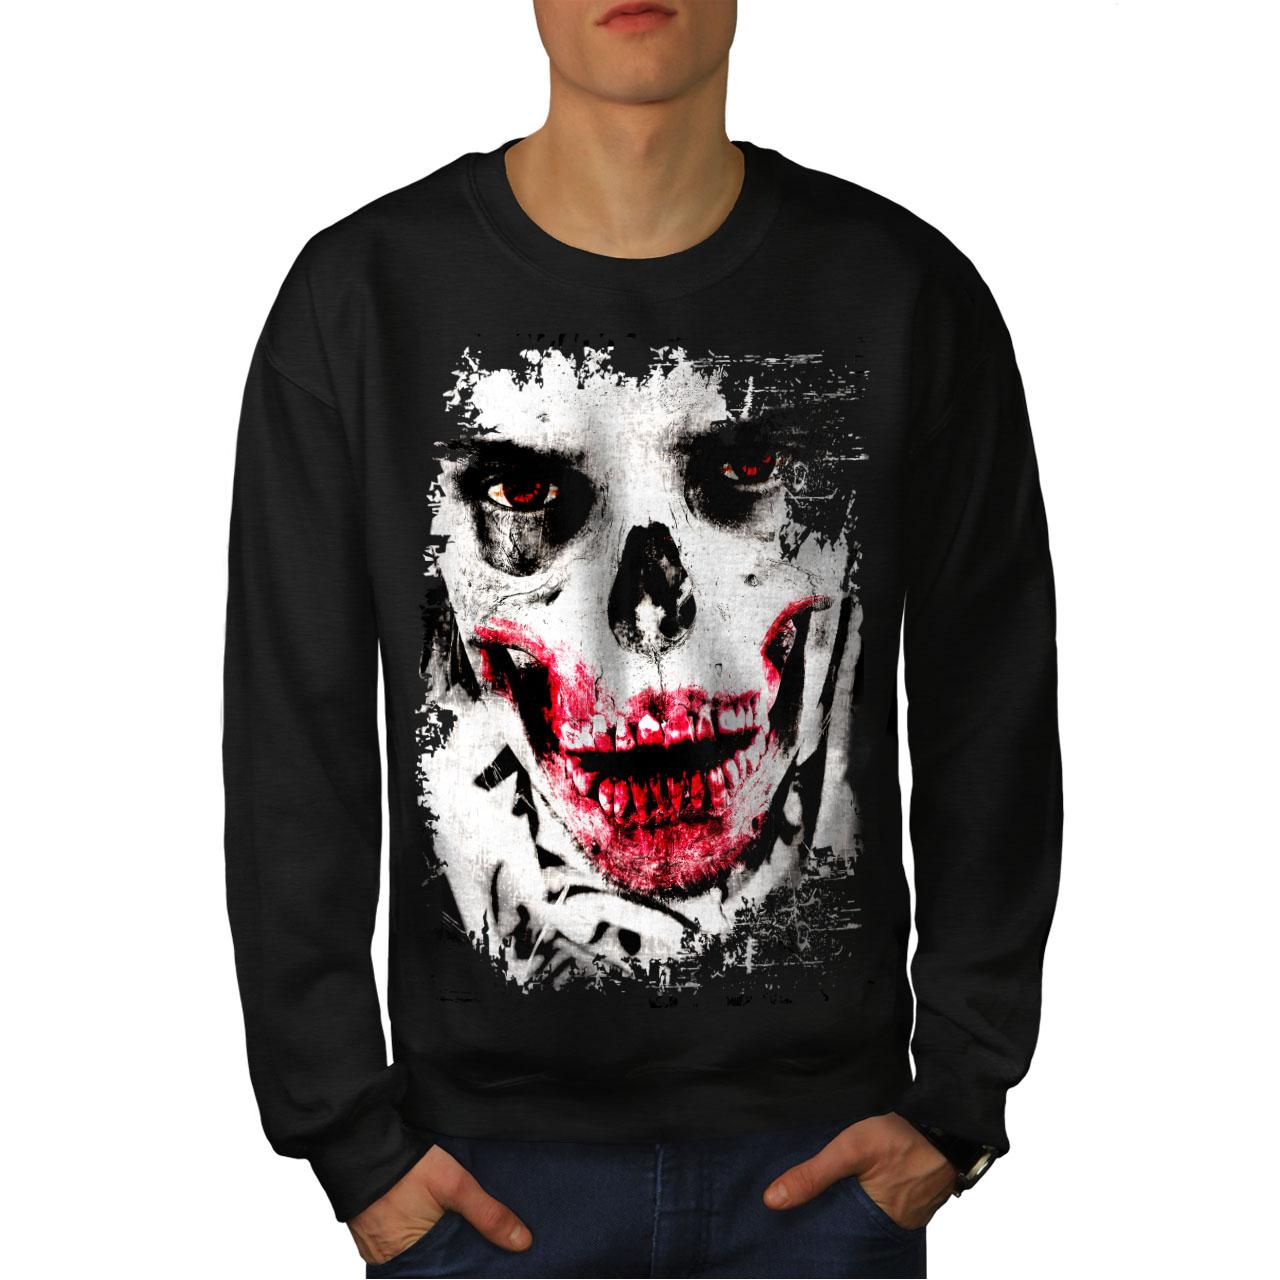 War Casual Jumper wellcoda Death Skeleton Rock Skull Mens Sweatshirt